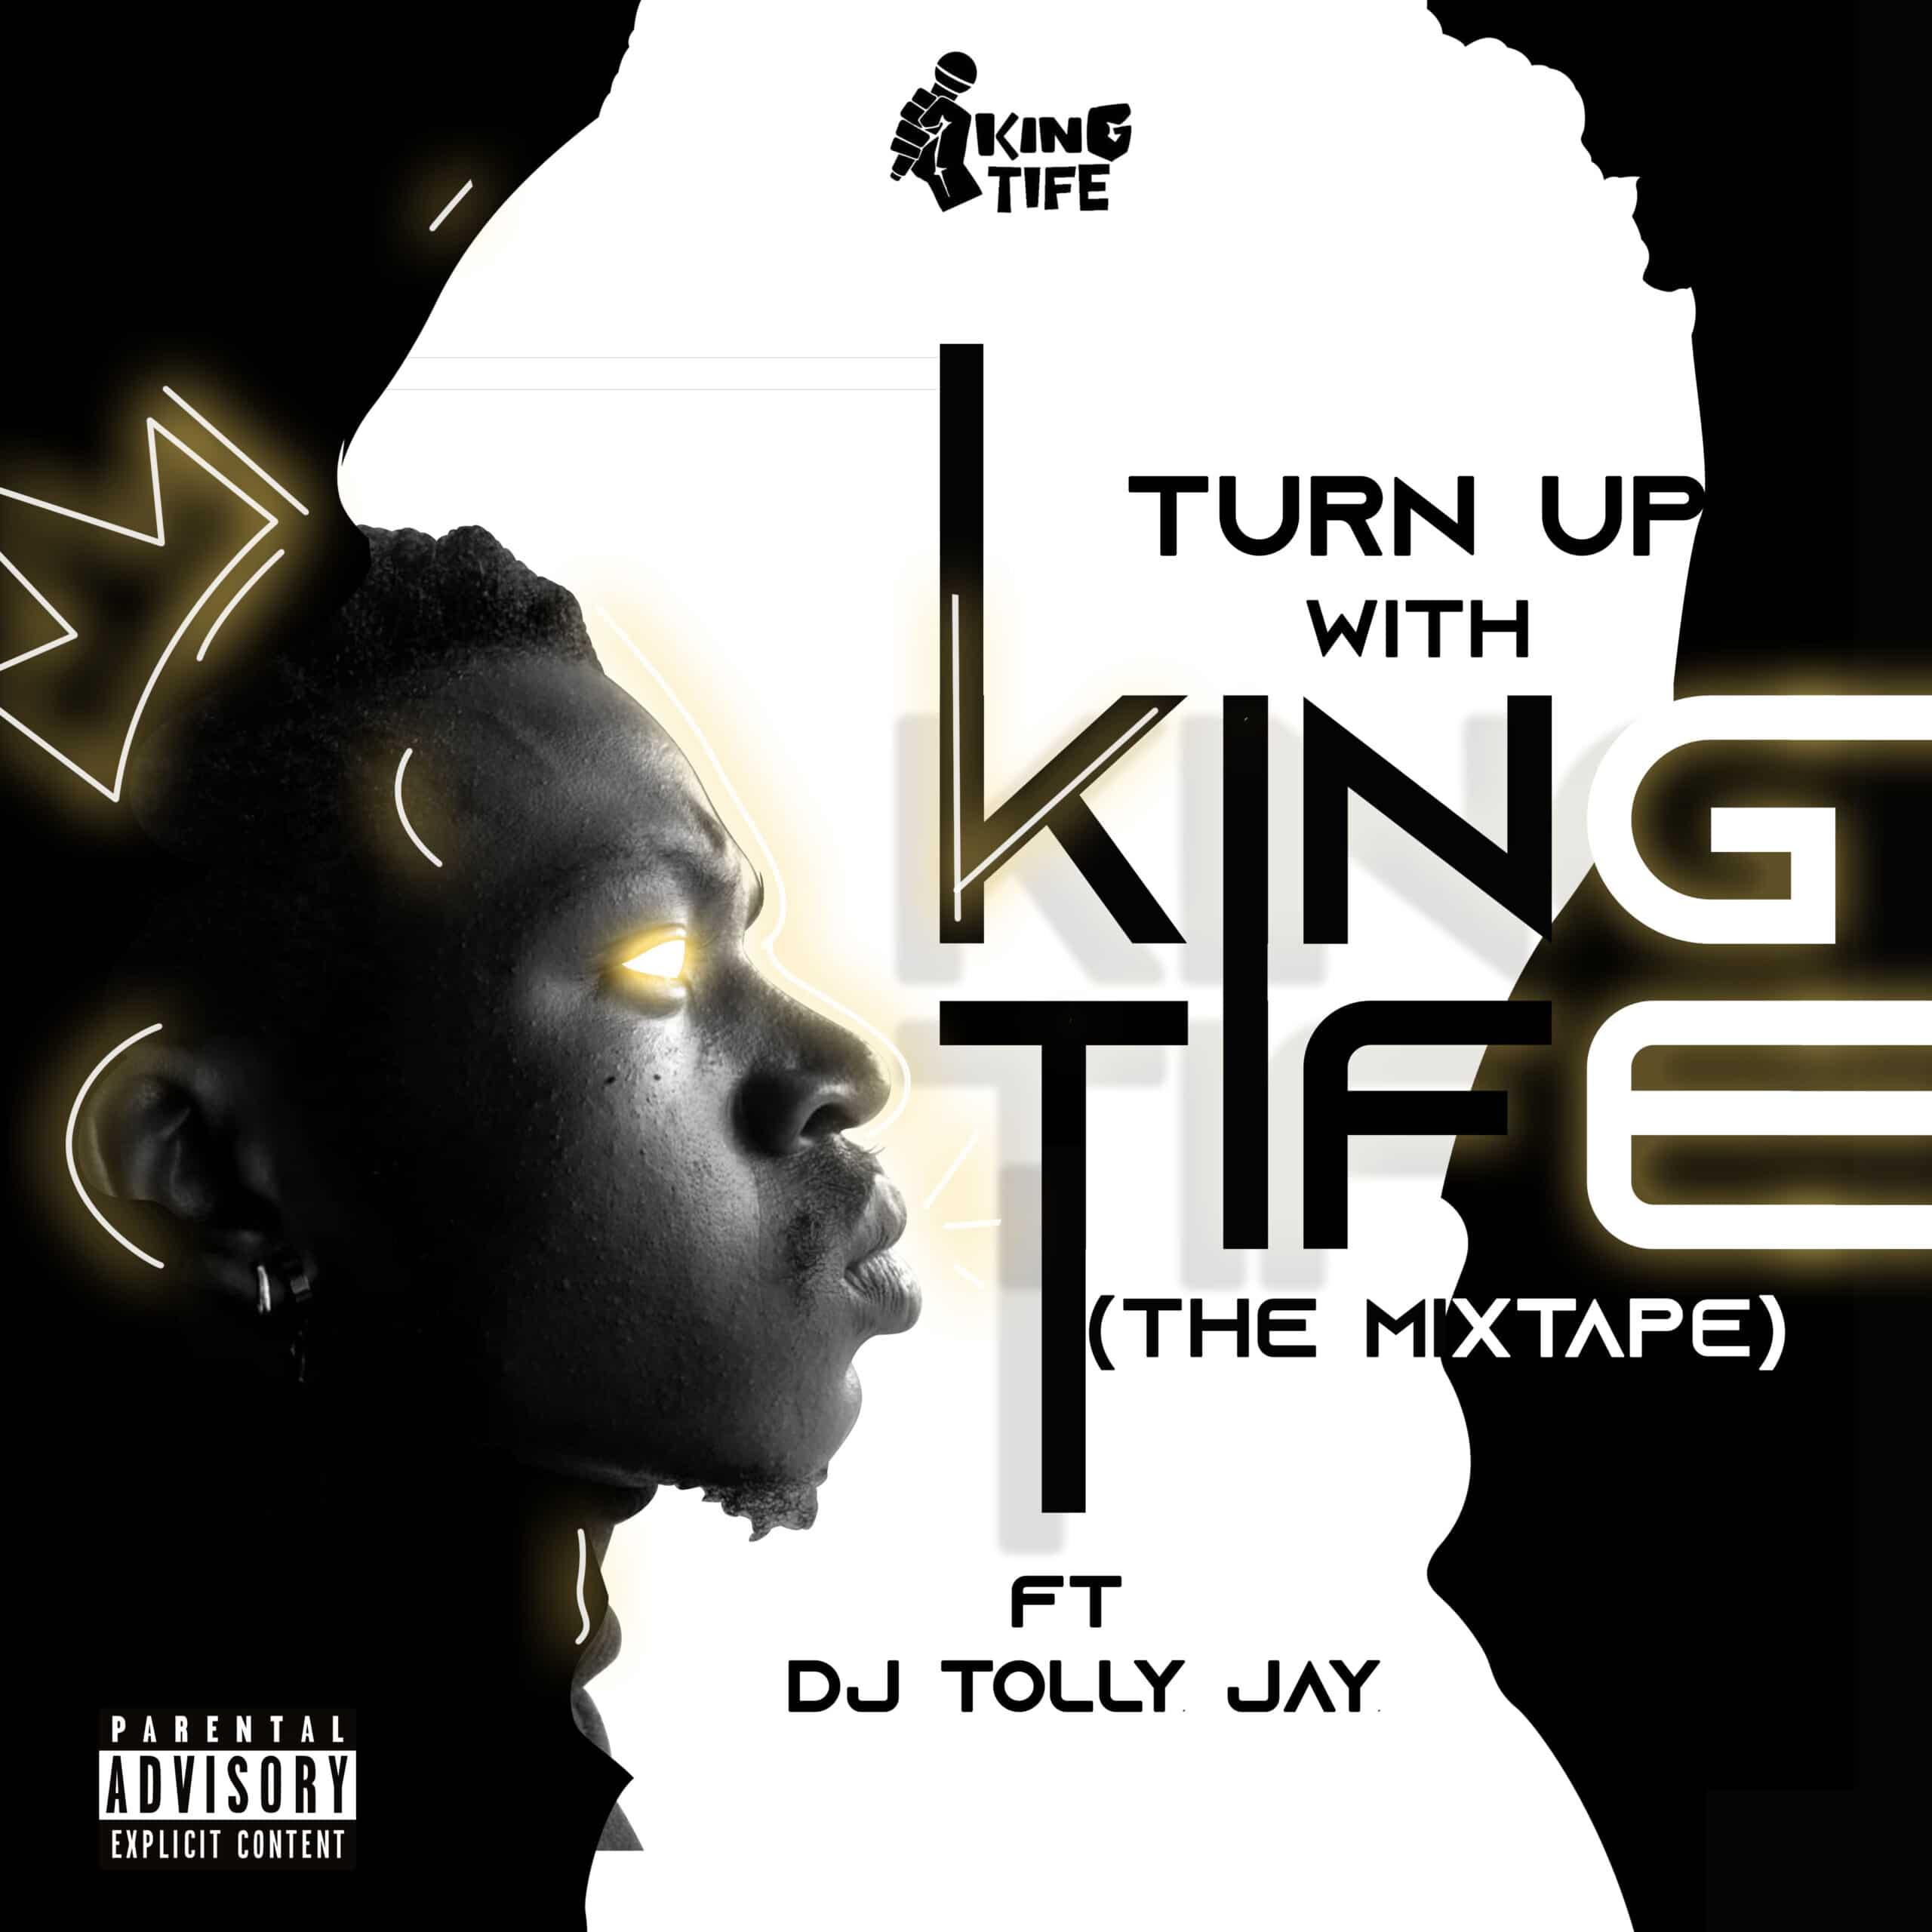 [MIXTAPE] KING TIFE FT DJ TOLLY JAY – TURN UP WITH KING TIFE (THE MIXTAPE)